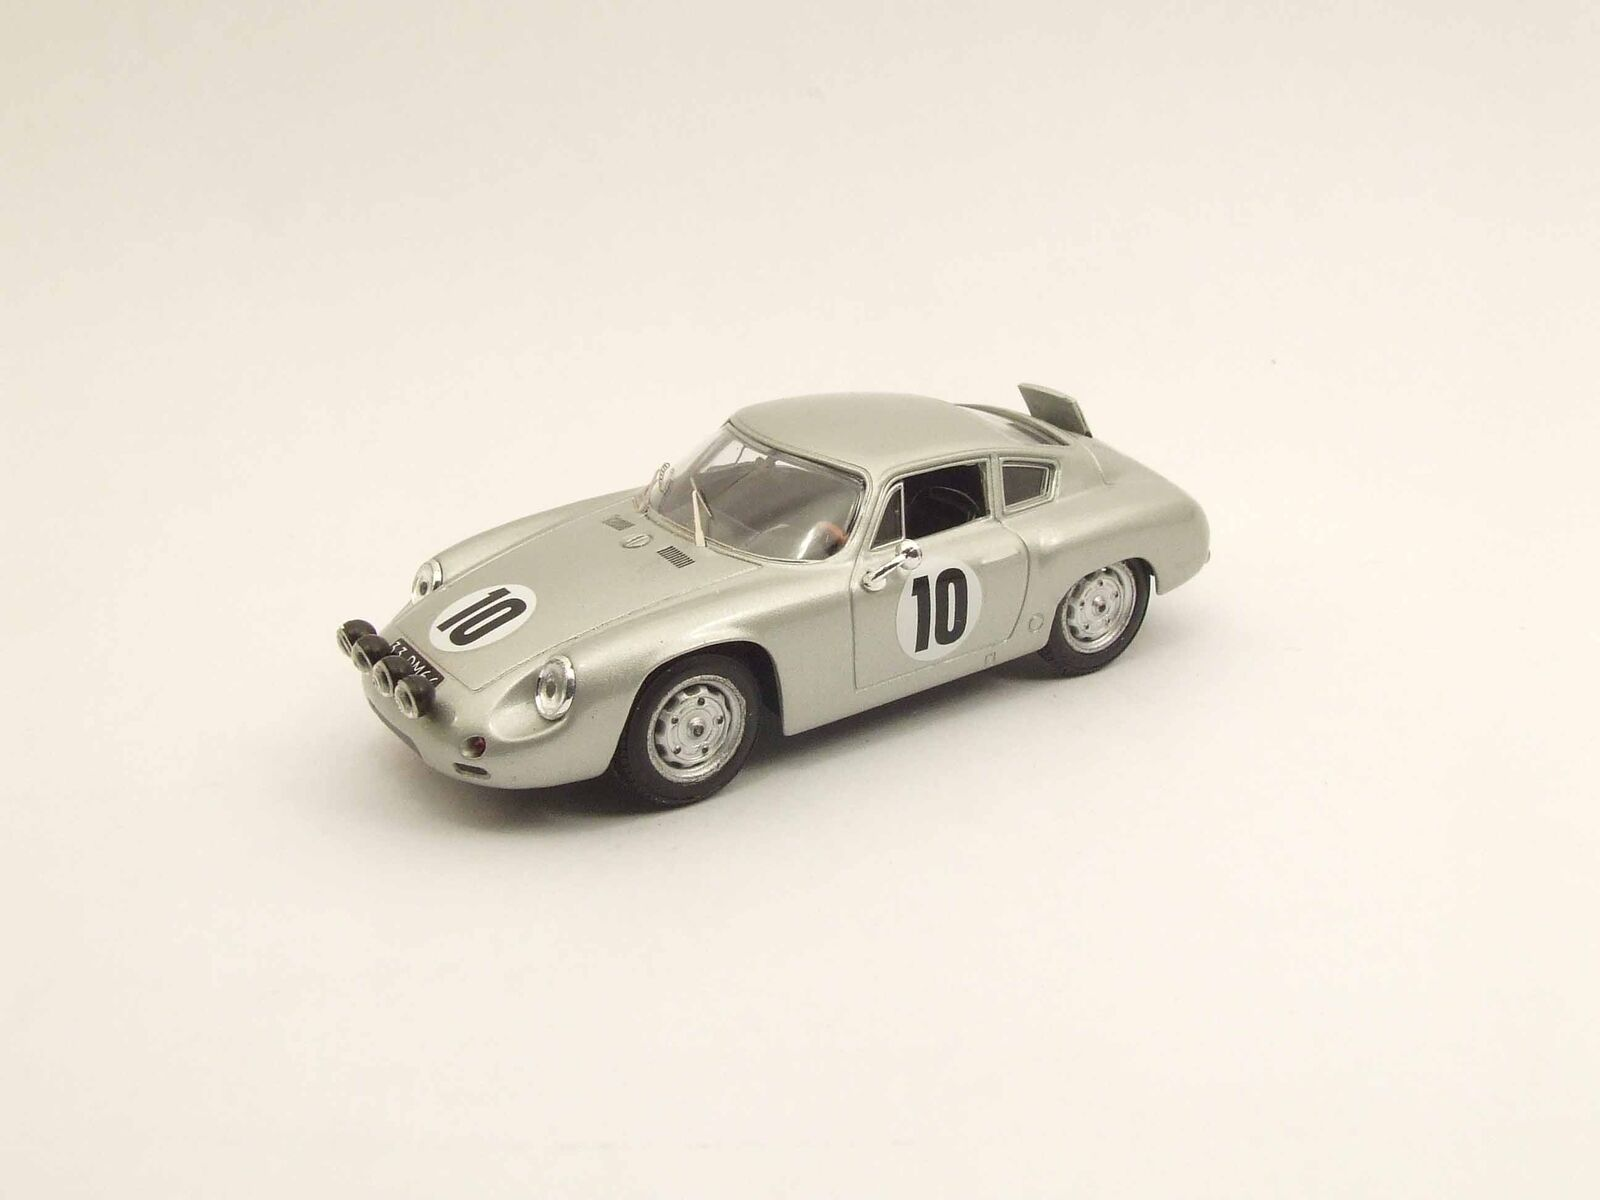 Porsche Abarth Rally Catalunas 1965 Team Pablo Picasso Best 1 43 Be9450  Model